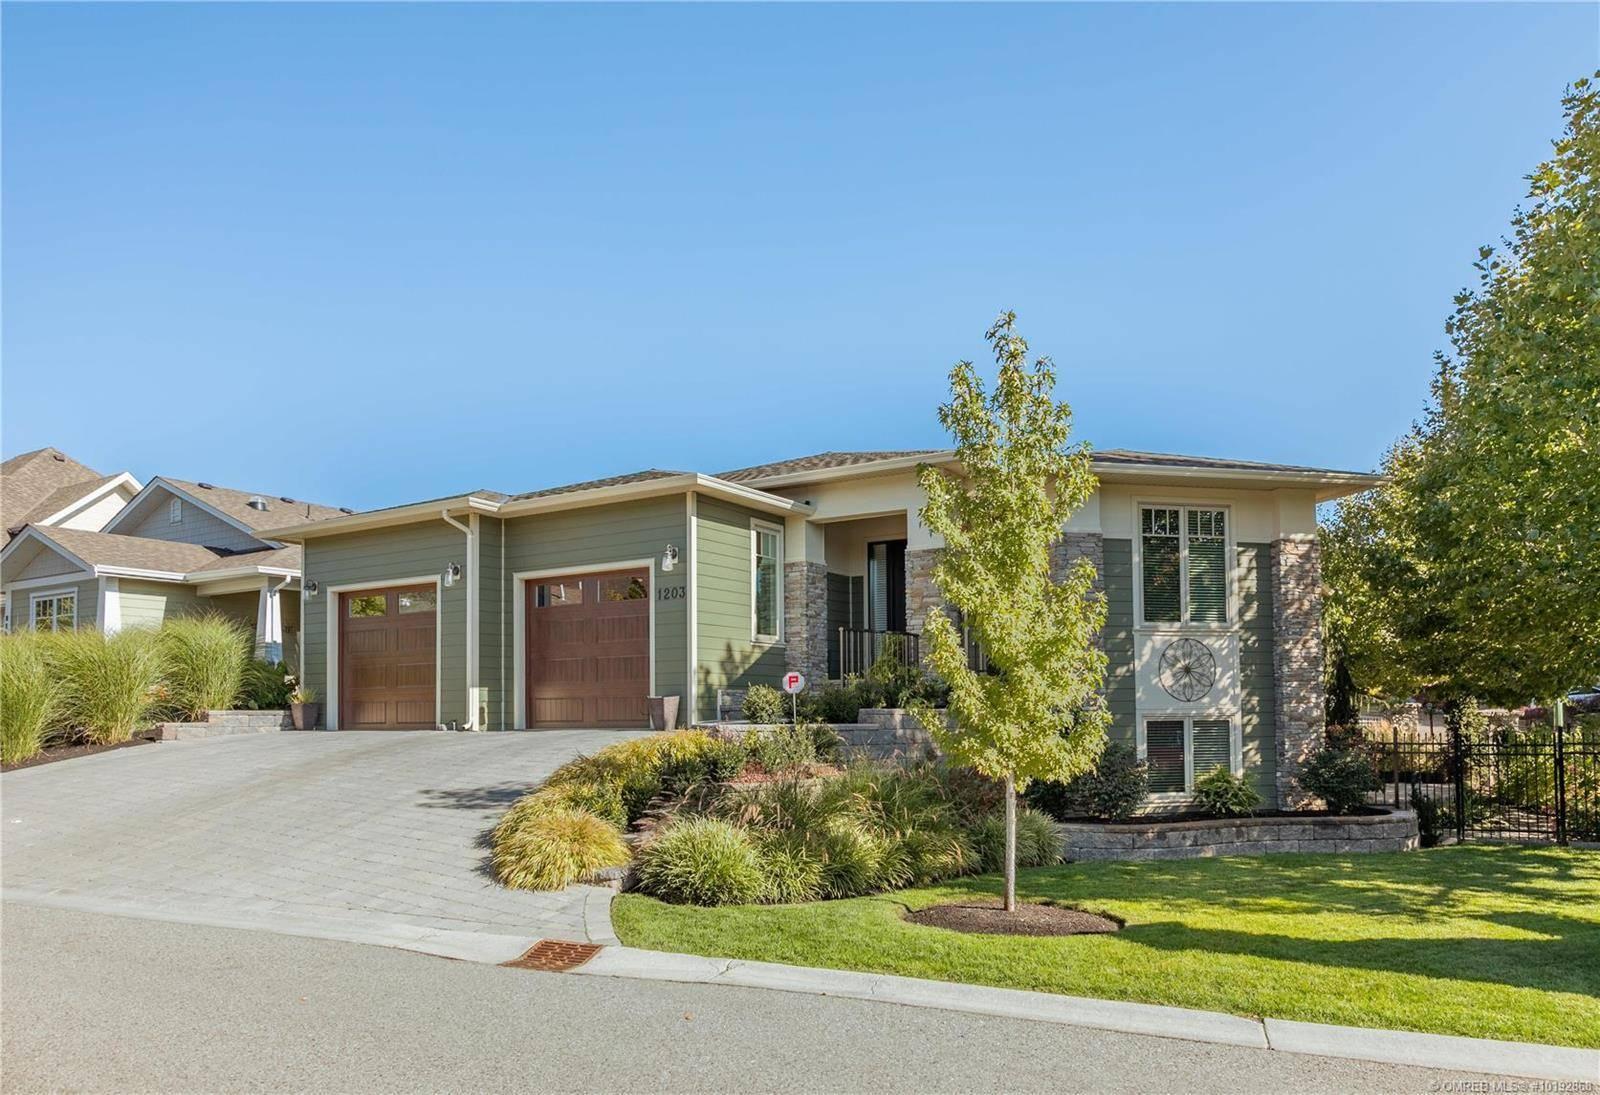 House for sale at 1203 Glenview Ct Kelowna British Columbia - MLS: 10192868